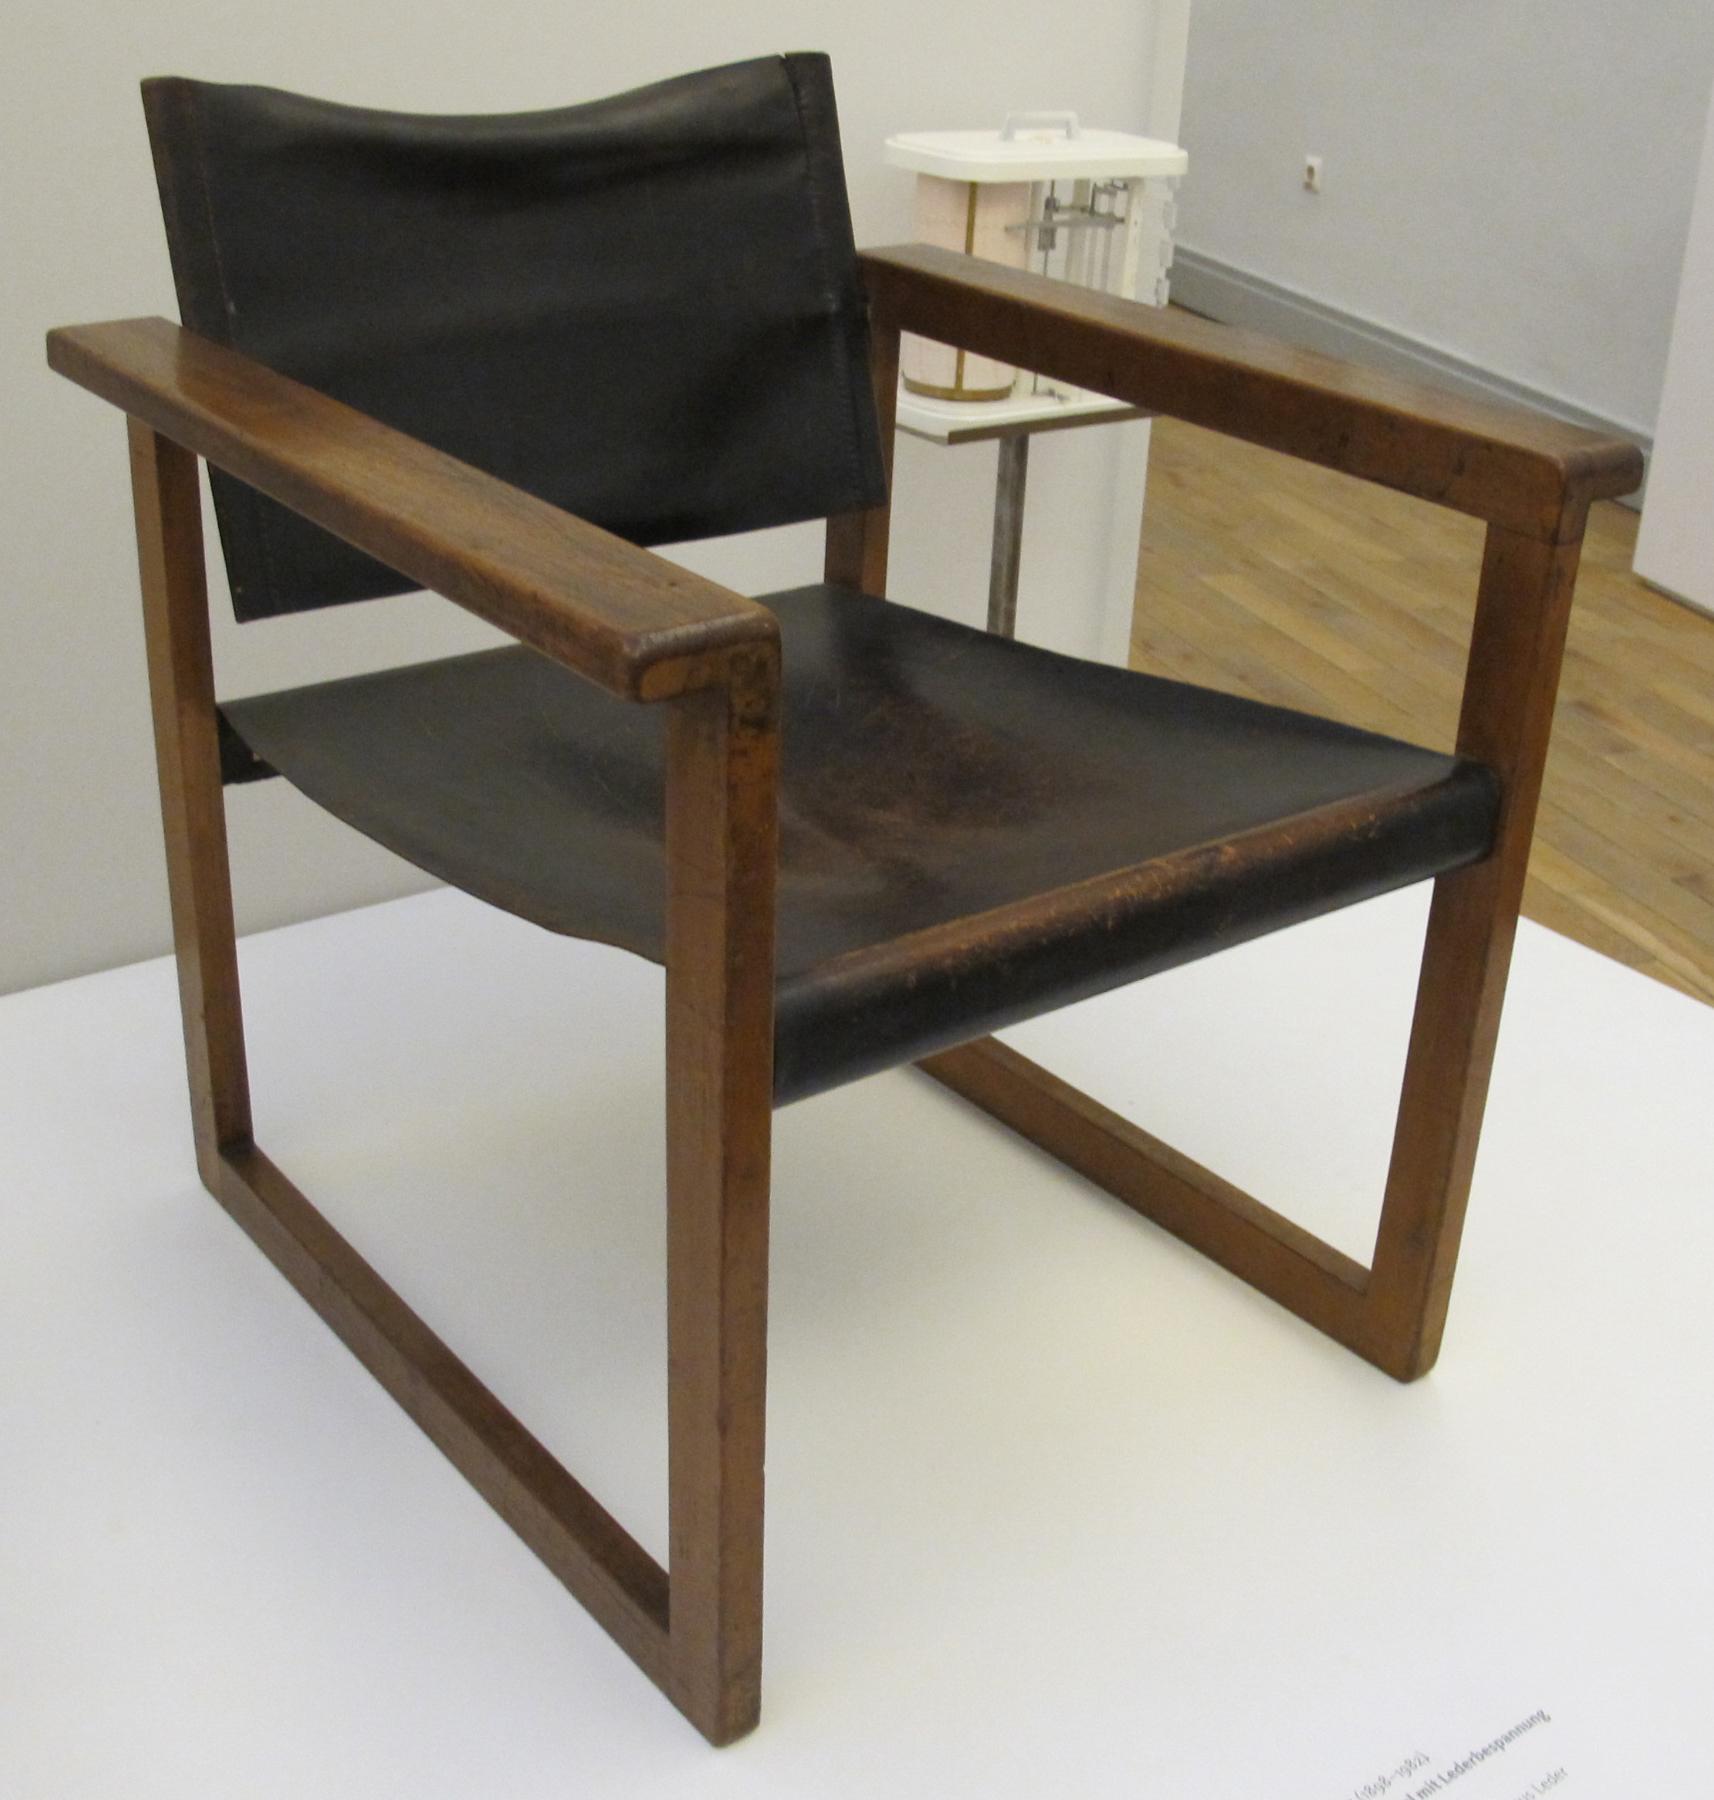 File:Peter keler, sedia con rivestimenti in pelle, 1925 ca.JPG ...